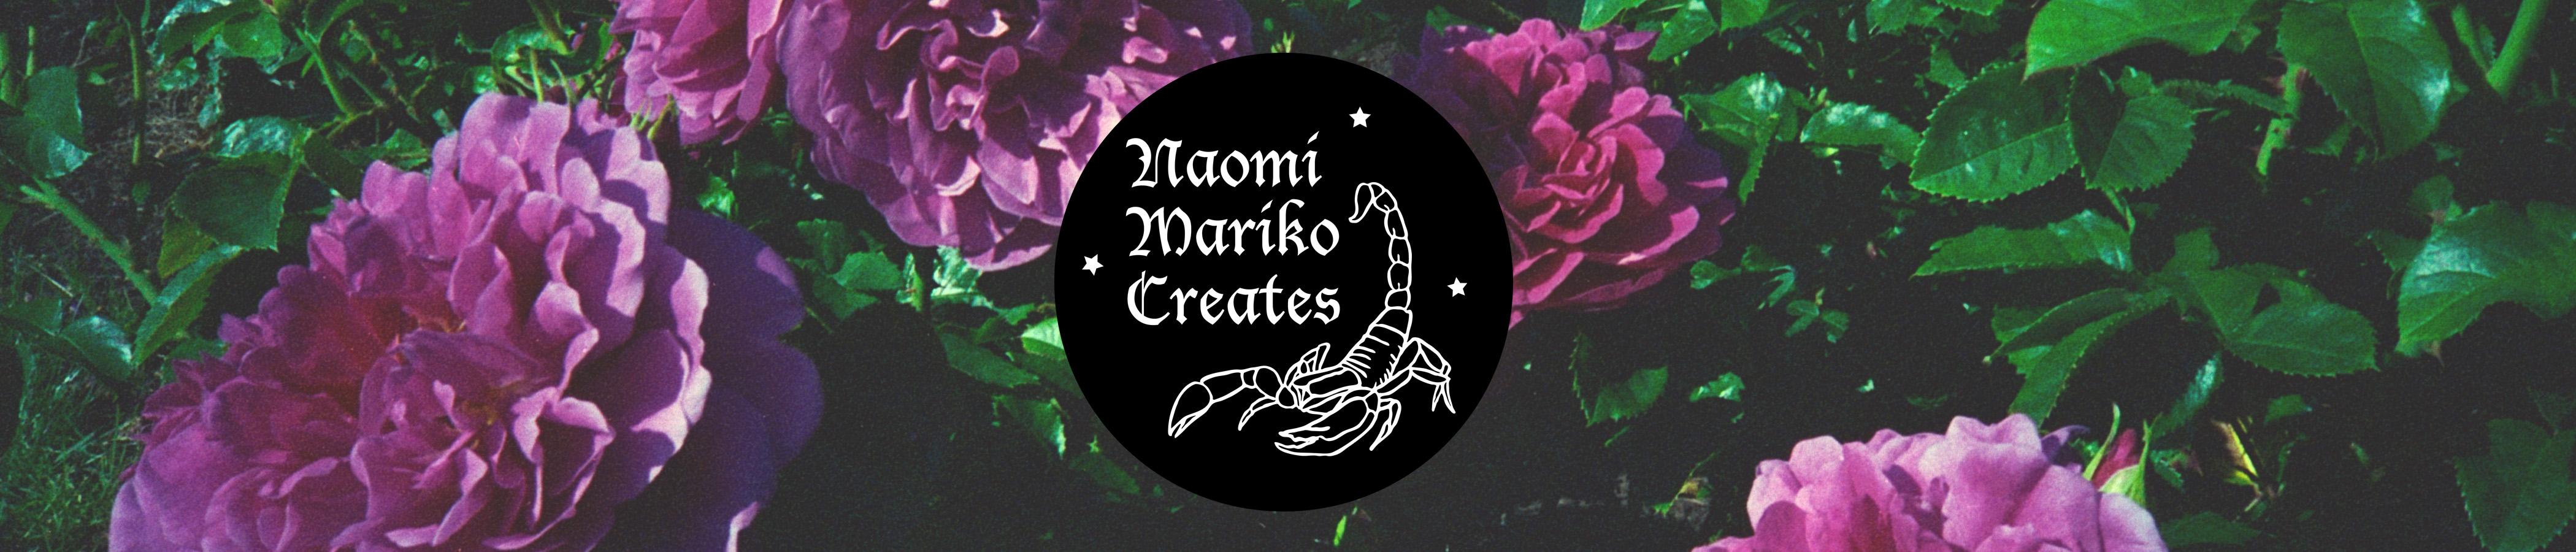 Naomi Mariko Creates